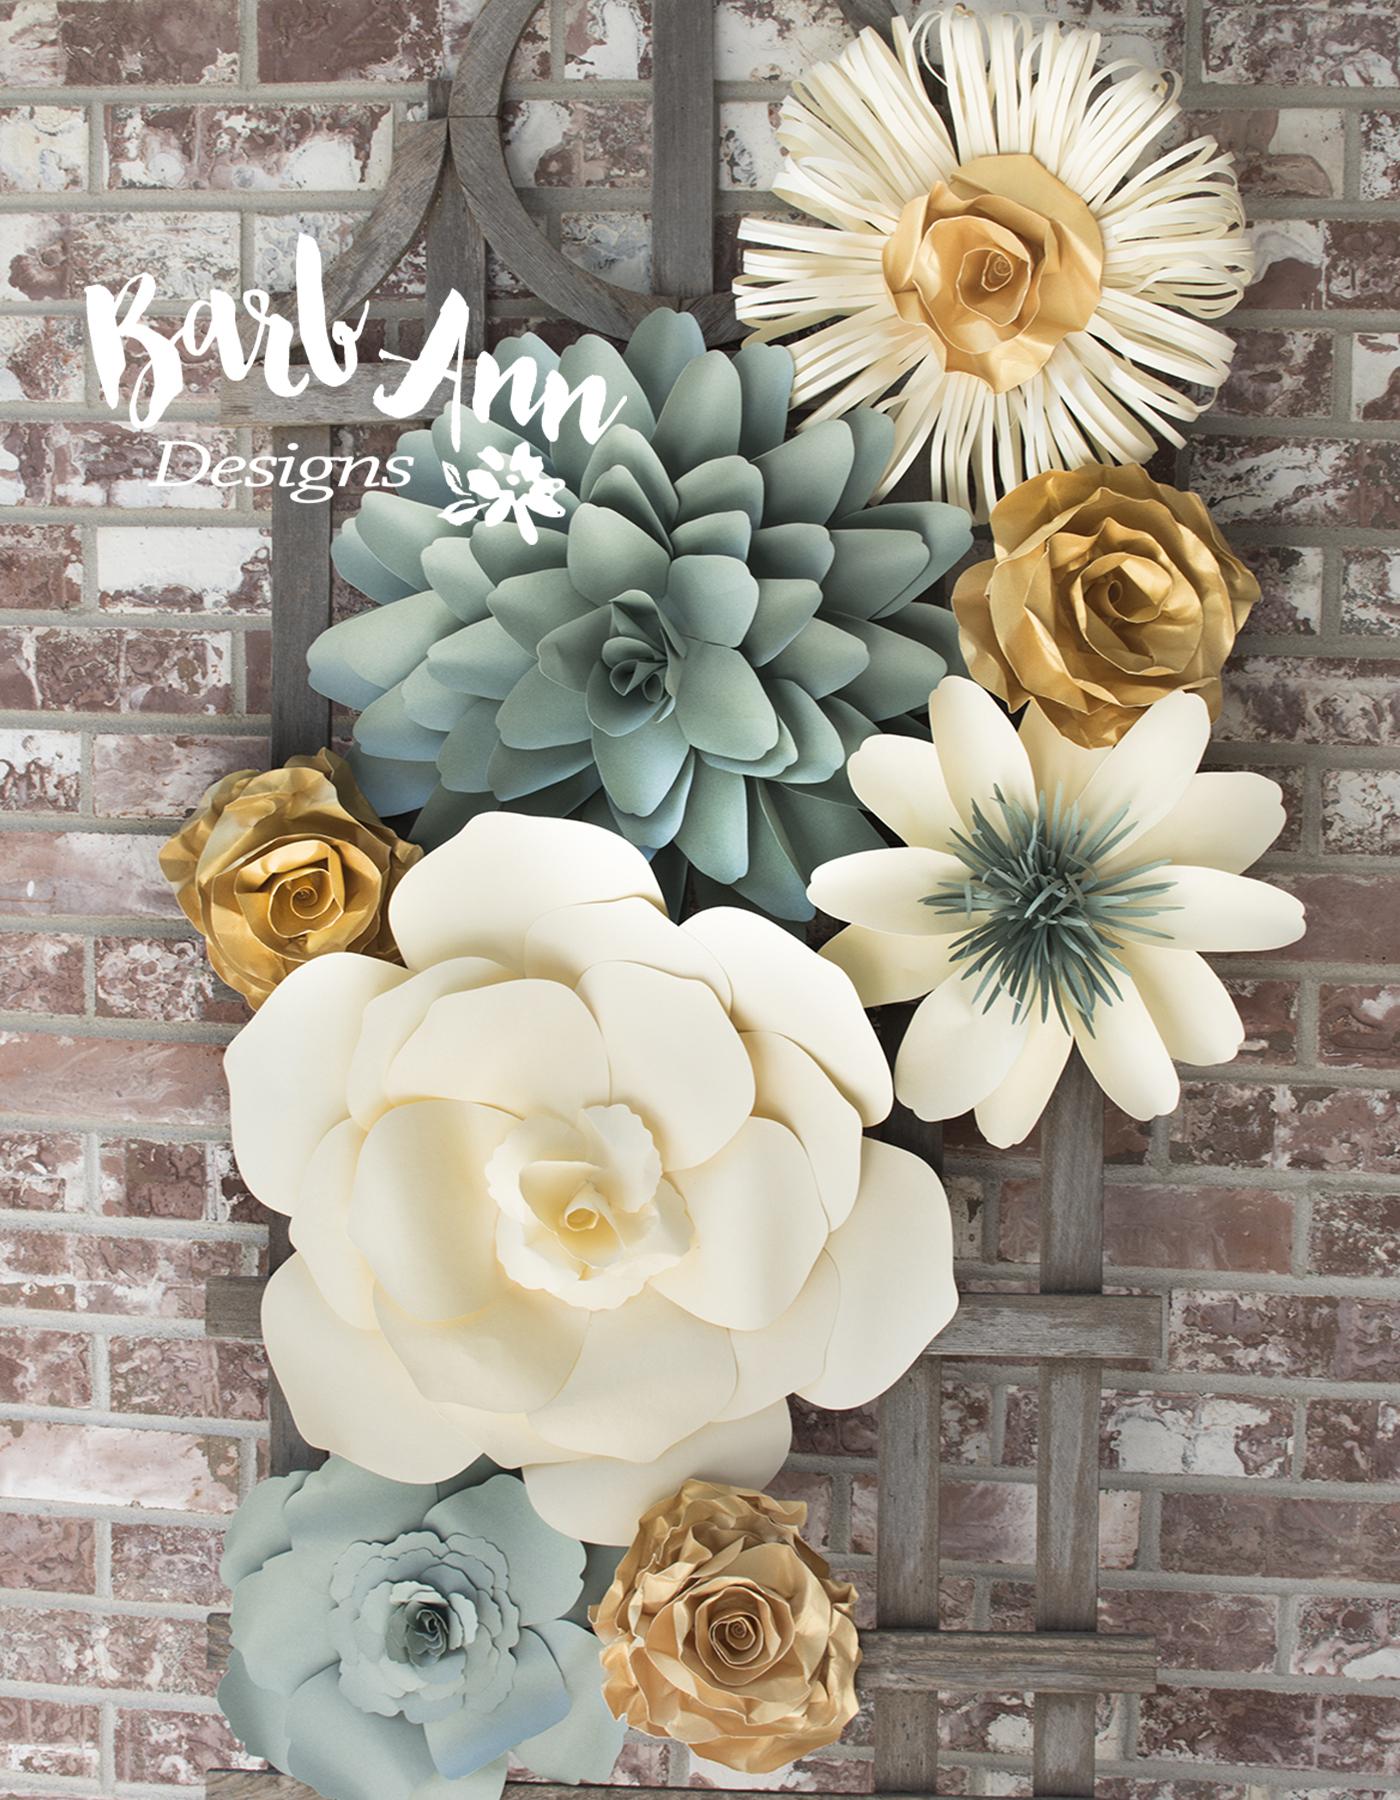 Eucalyptus Gold Cream Large Paper Flower Wall Backdrop Barb Ann Designs